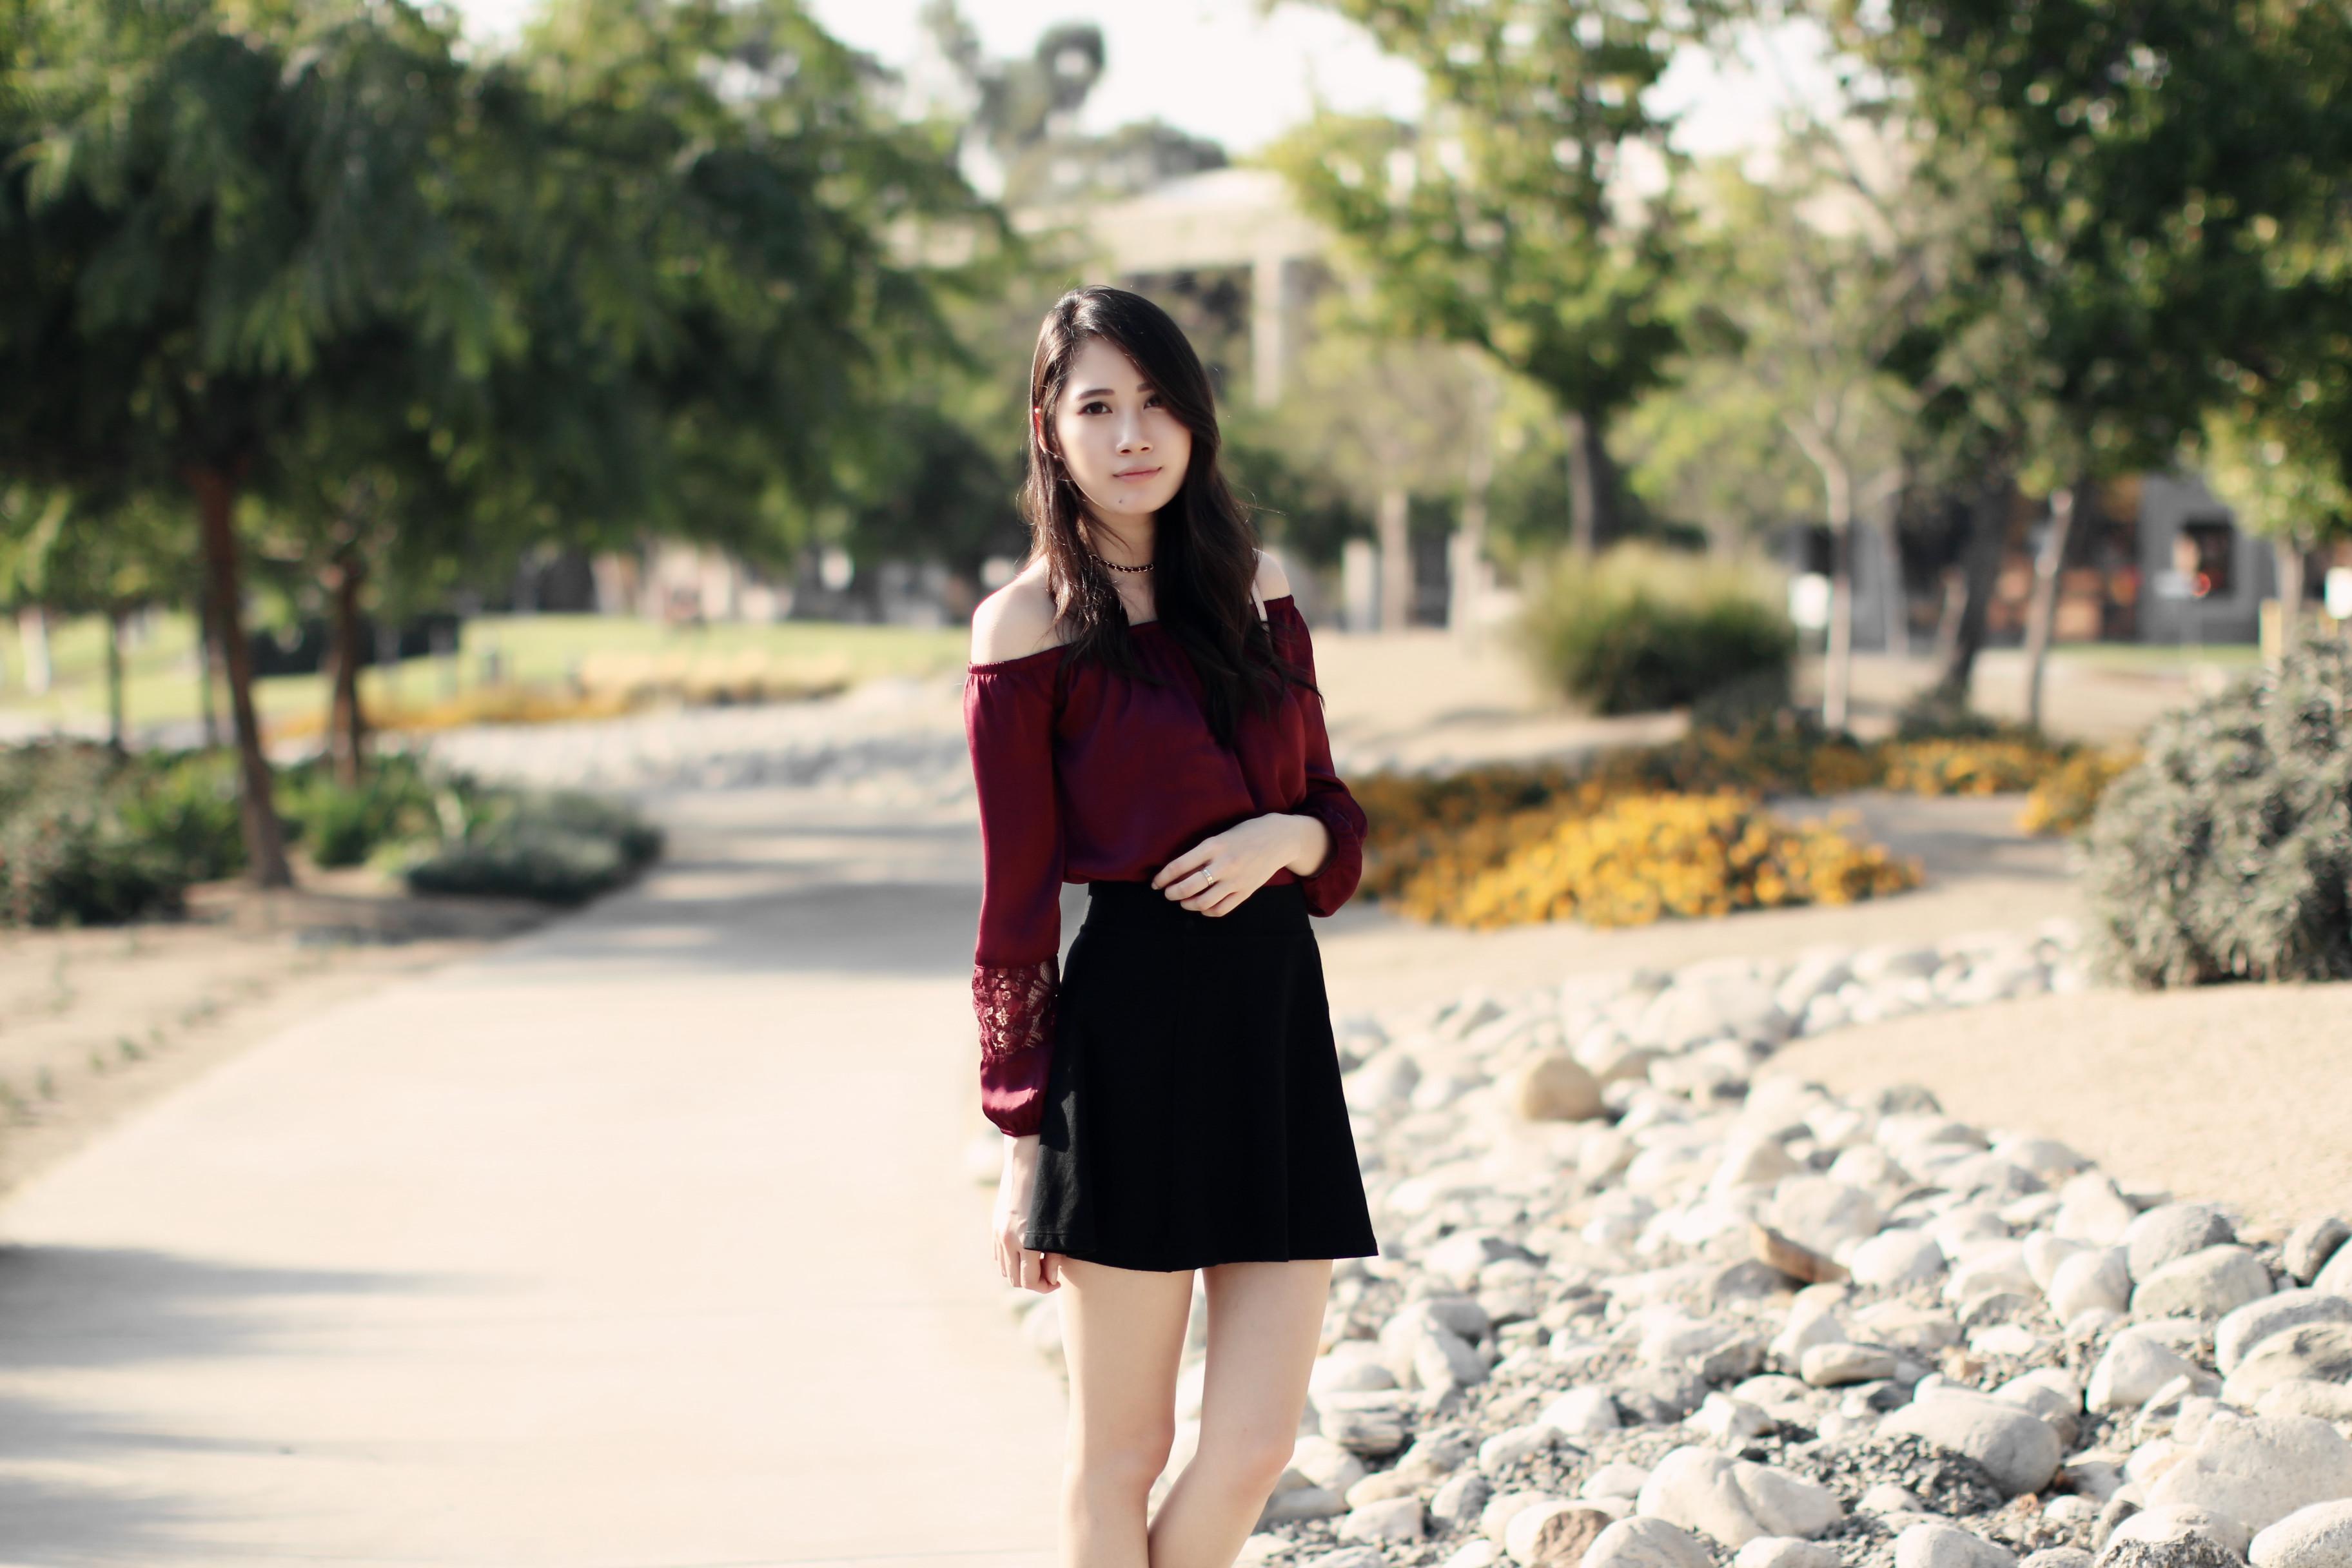 3591-ootd-fashion-style-outfitoftheday-wiwt-silk-lace-fallfashion-forever21-f21xme-elizabeeetht-clothestoyouuu